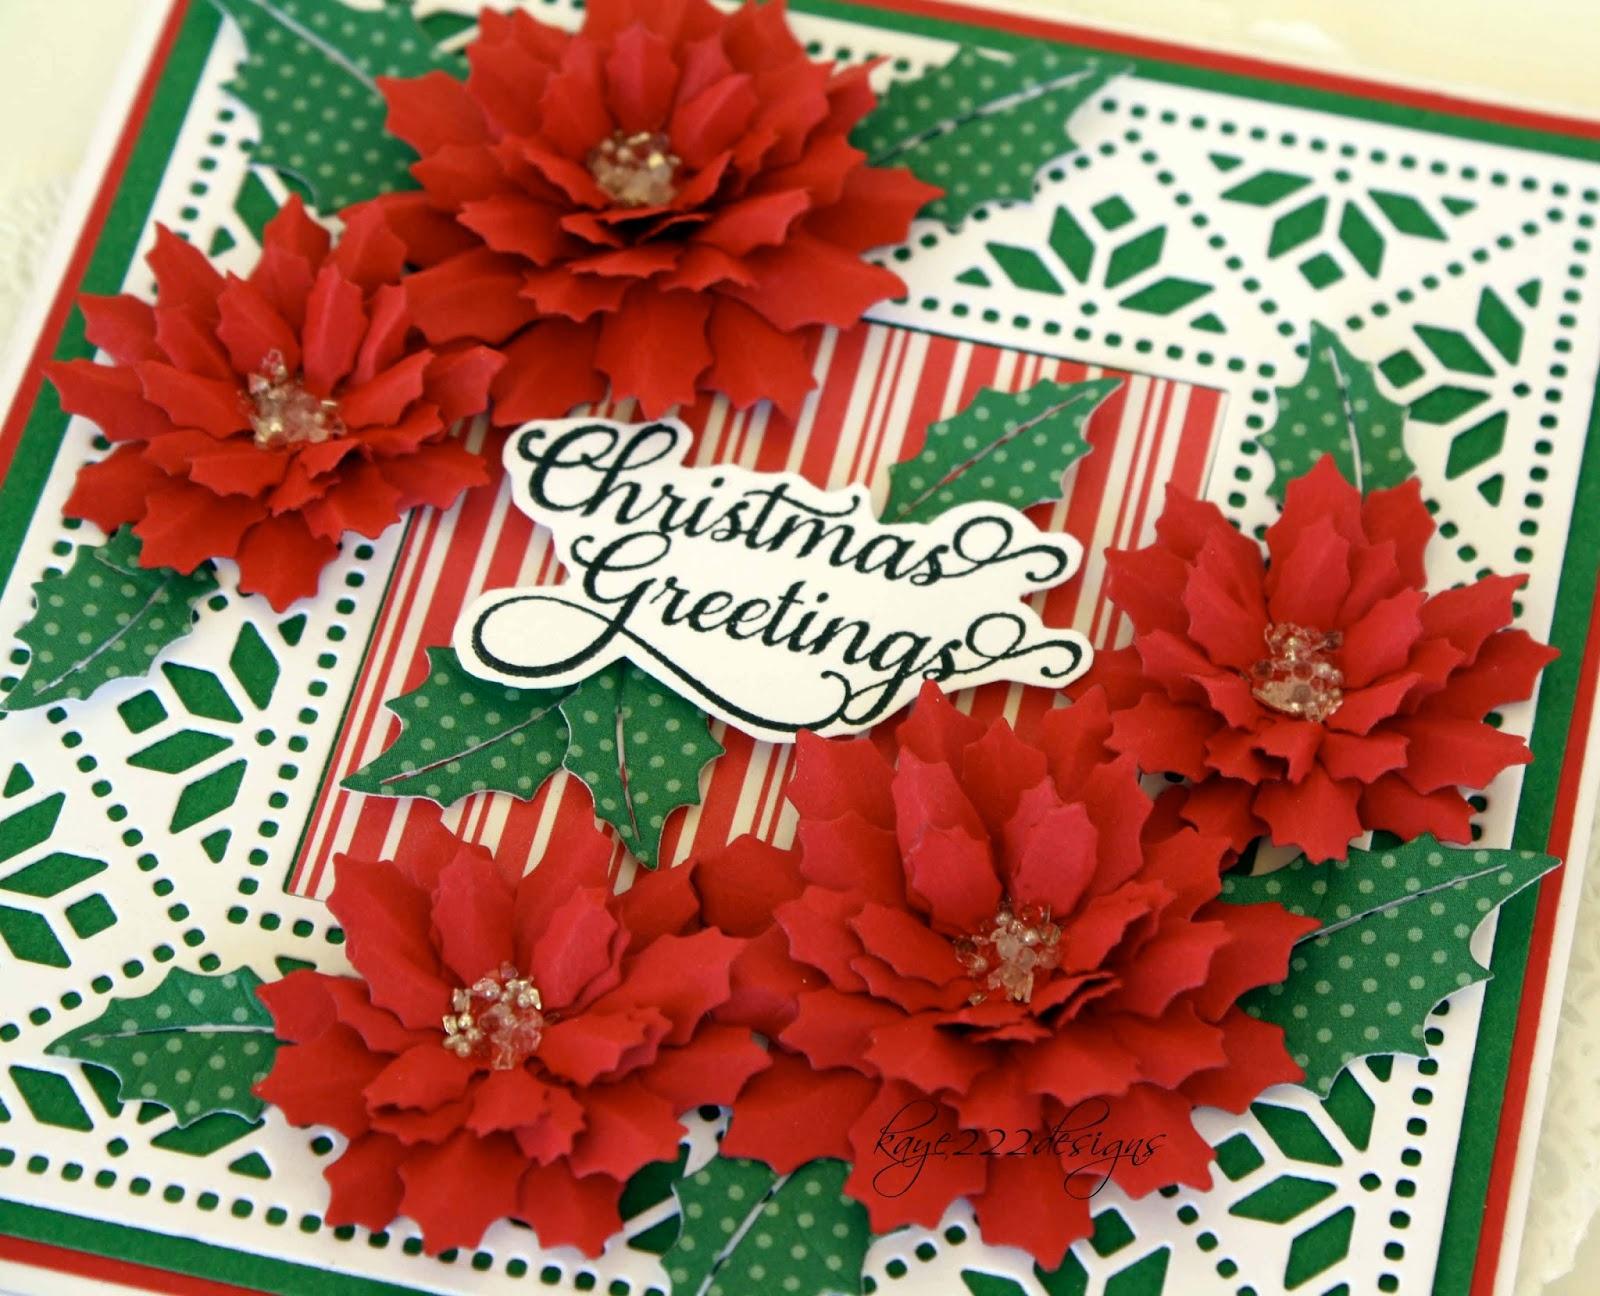 Beyond beauty christmas greetings with cheery lynn designs cheery lynn designs dies used kristyandbryce Images